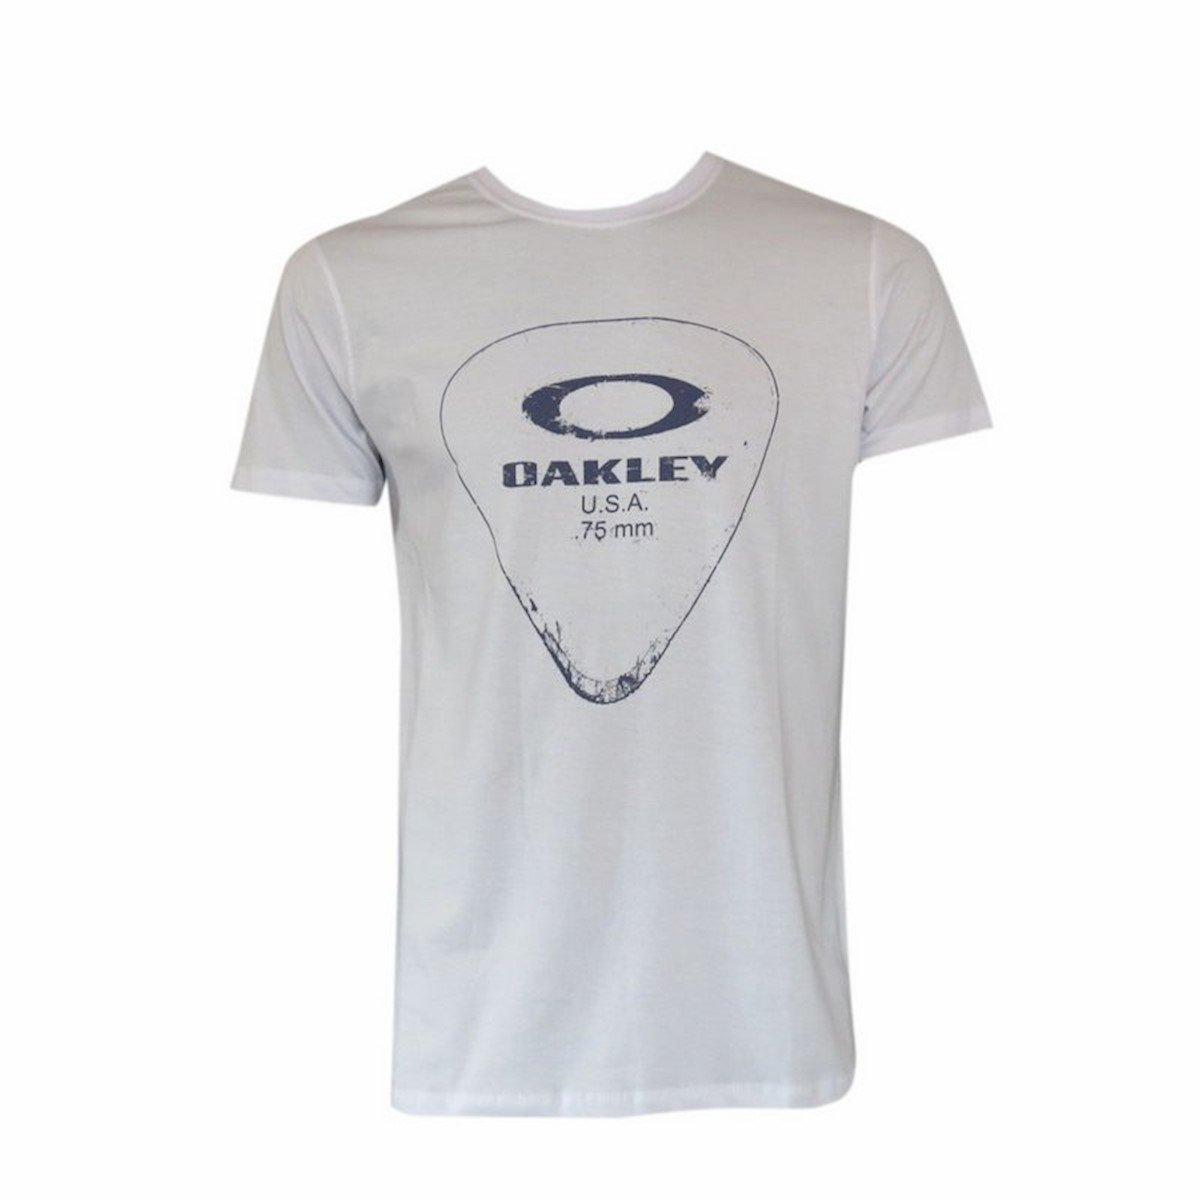 Camiseta Friedpick Tee Oakley Masculina - Compre Agora  22925f05a23